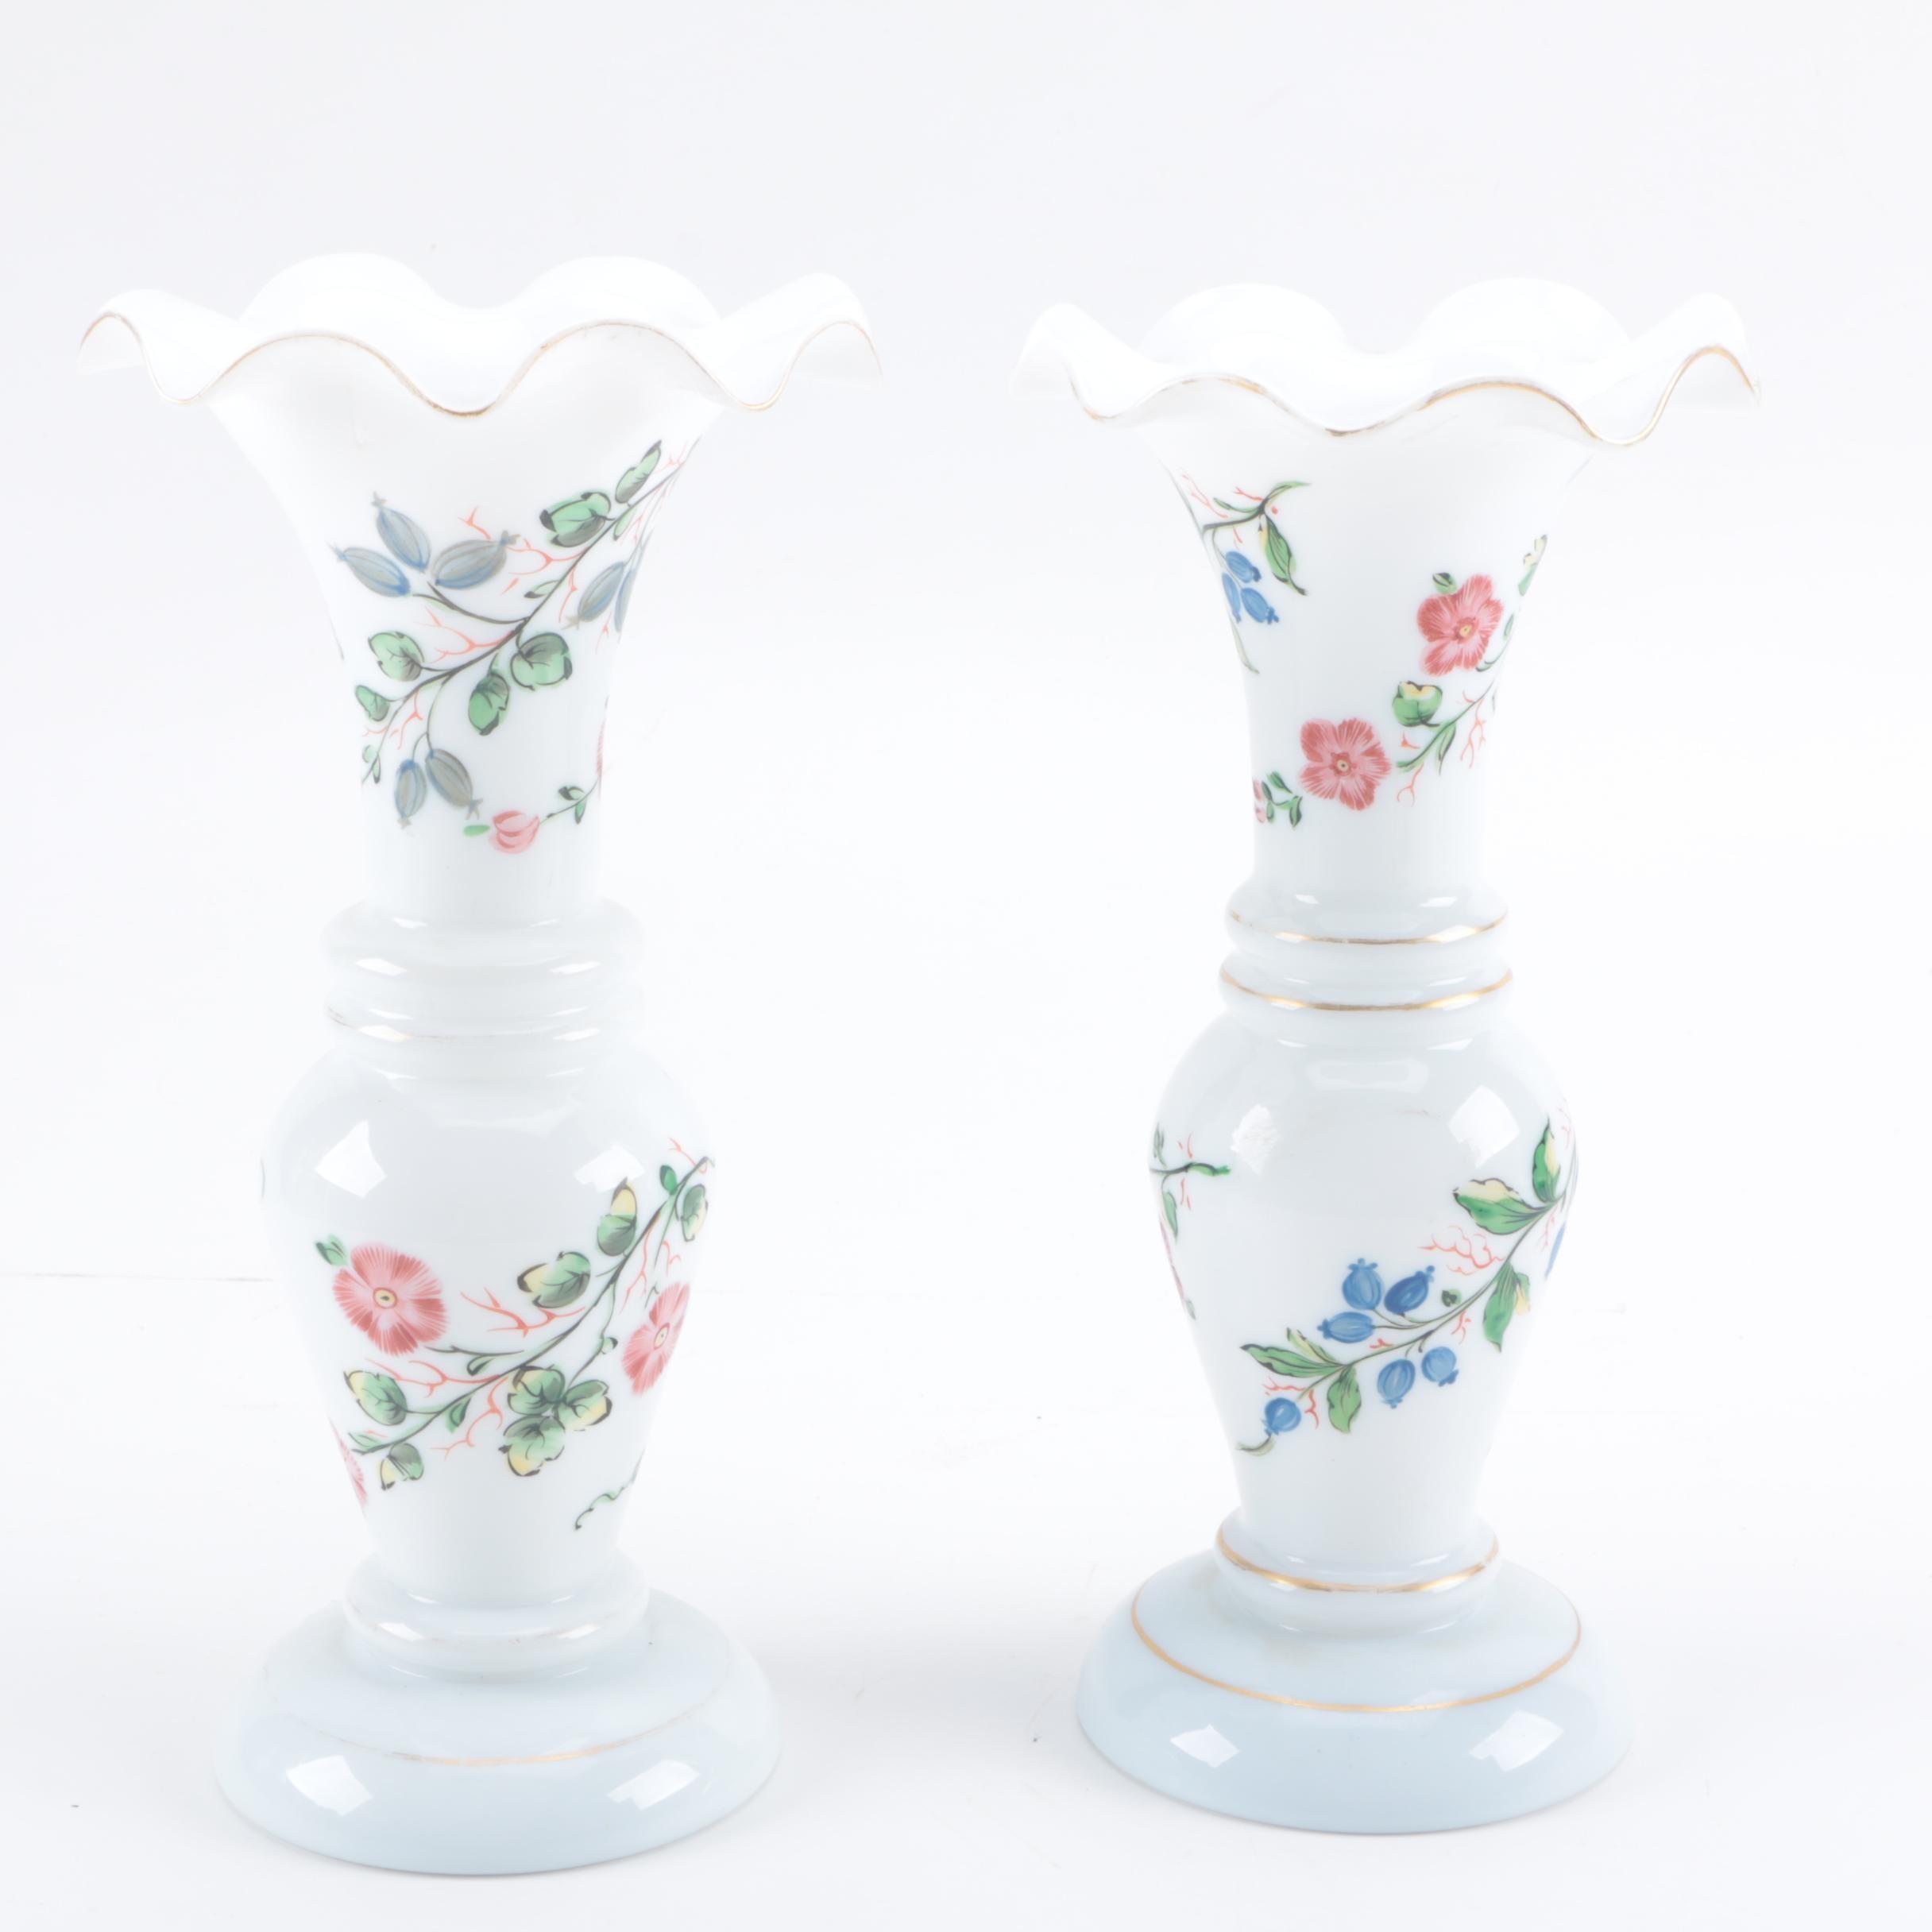 Handpainted Blown Milk Glass Vases